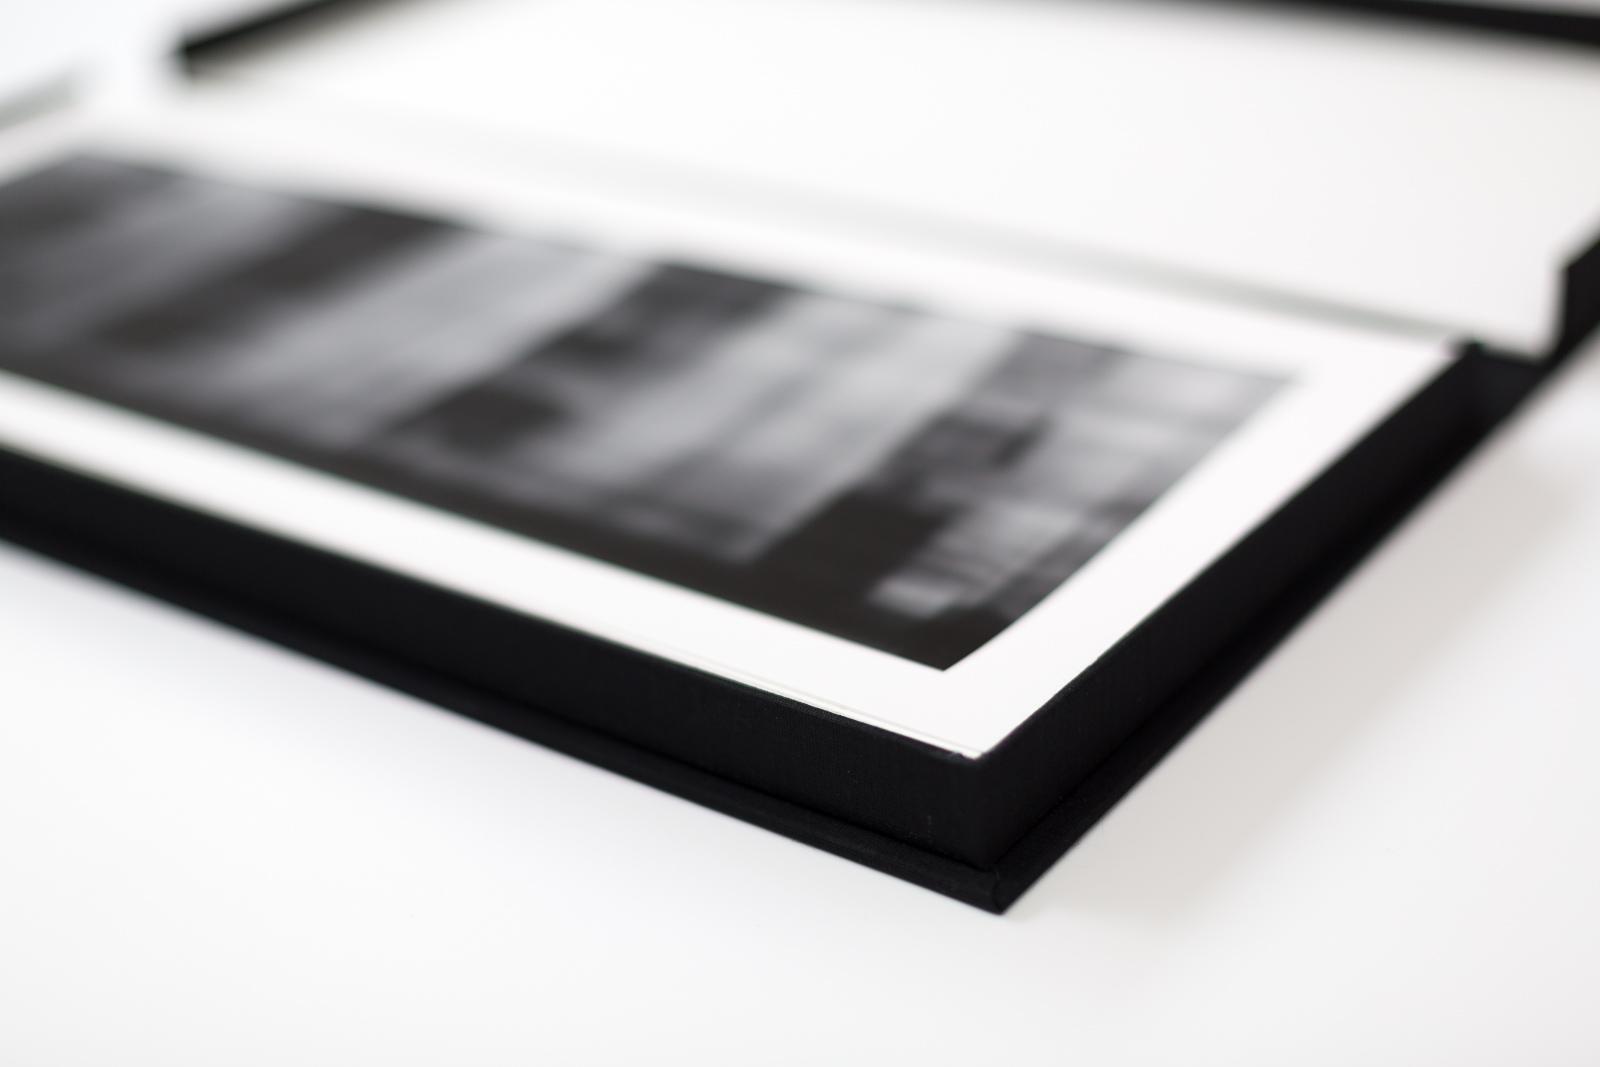 Karl Burke 1916 Elements of an Insurrection Portfolio Box-4.jpg